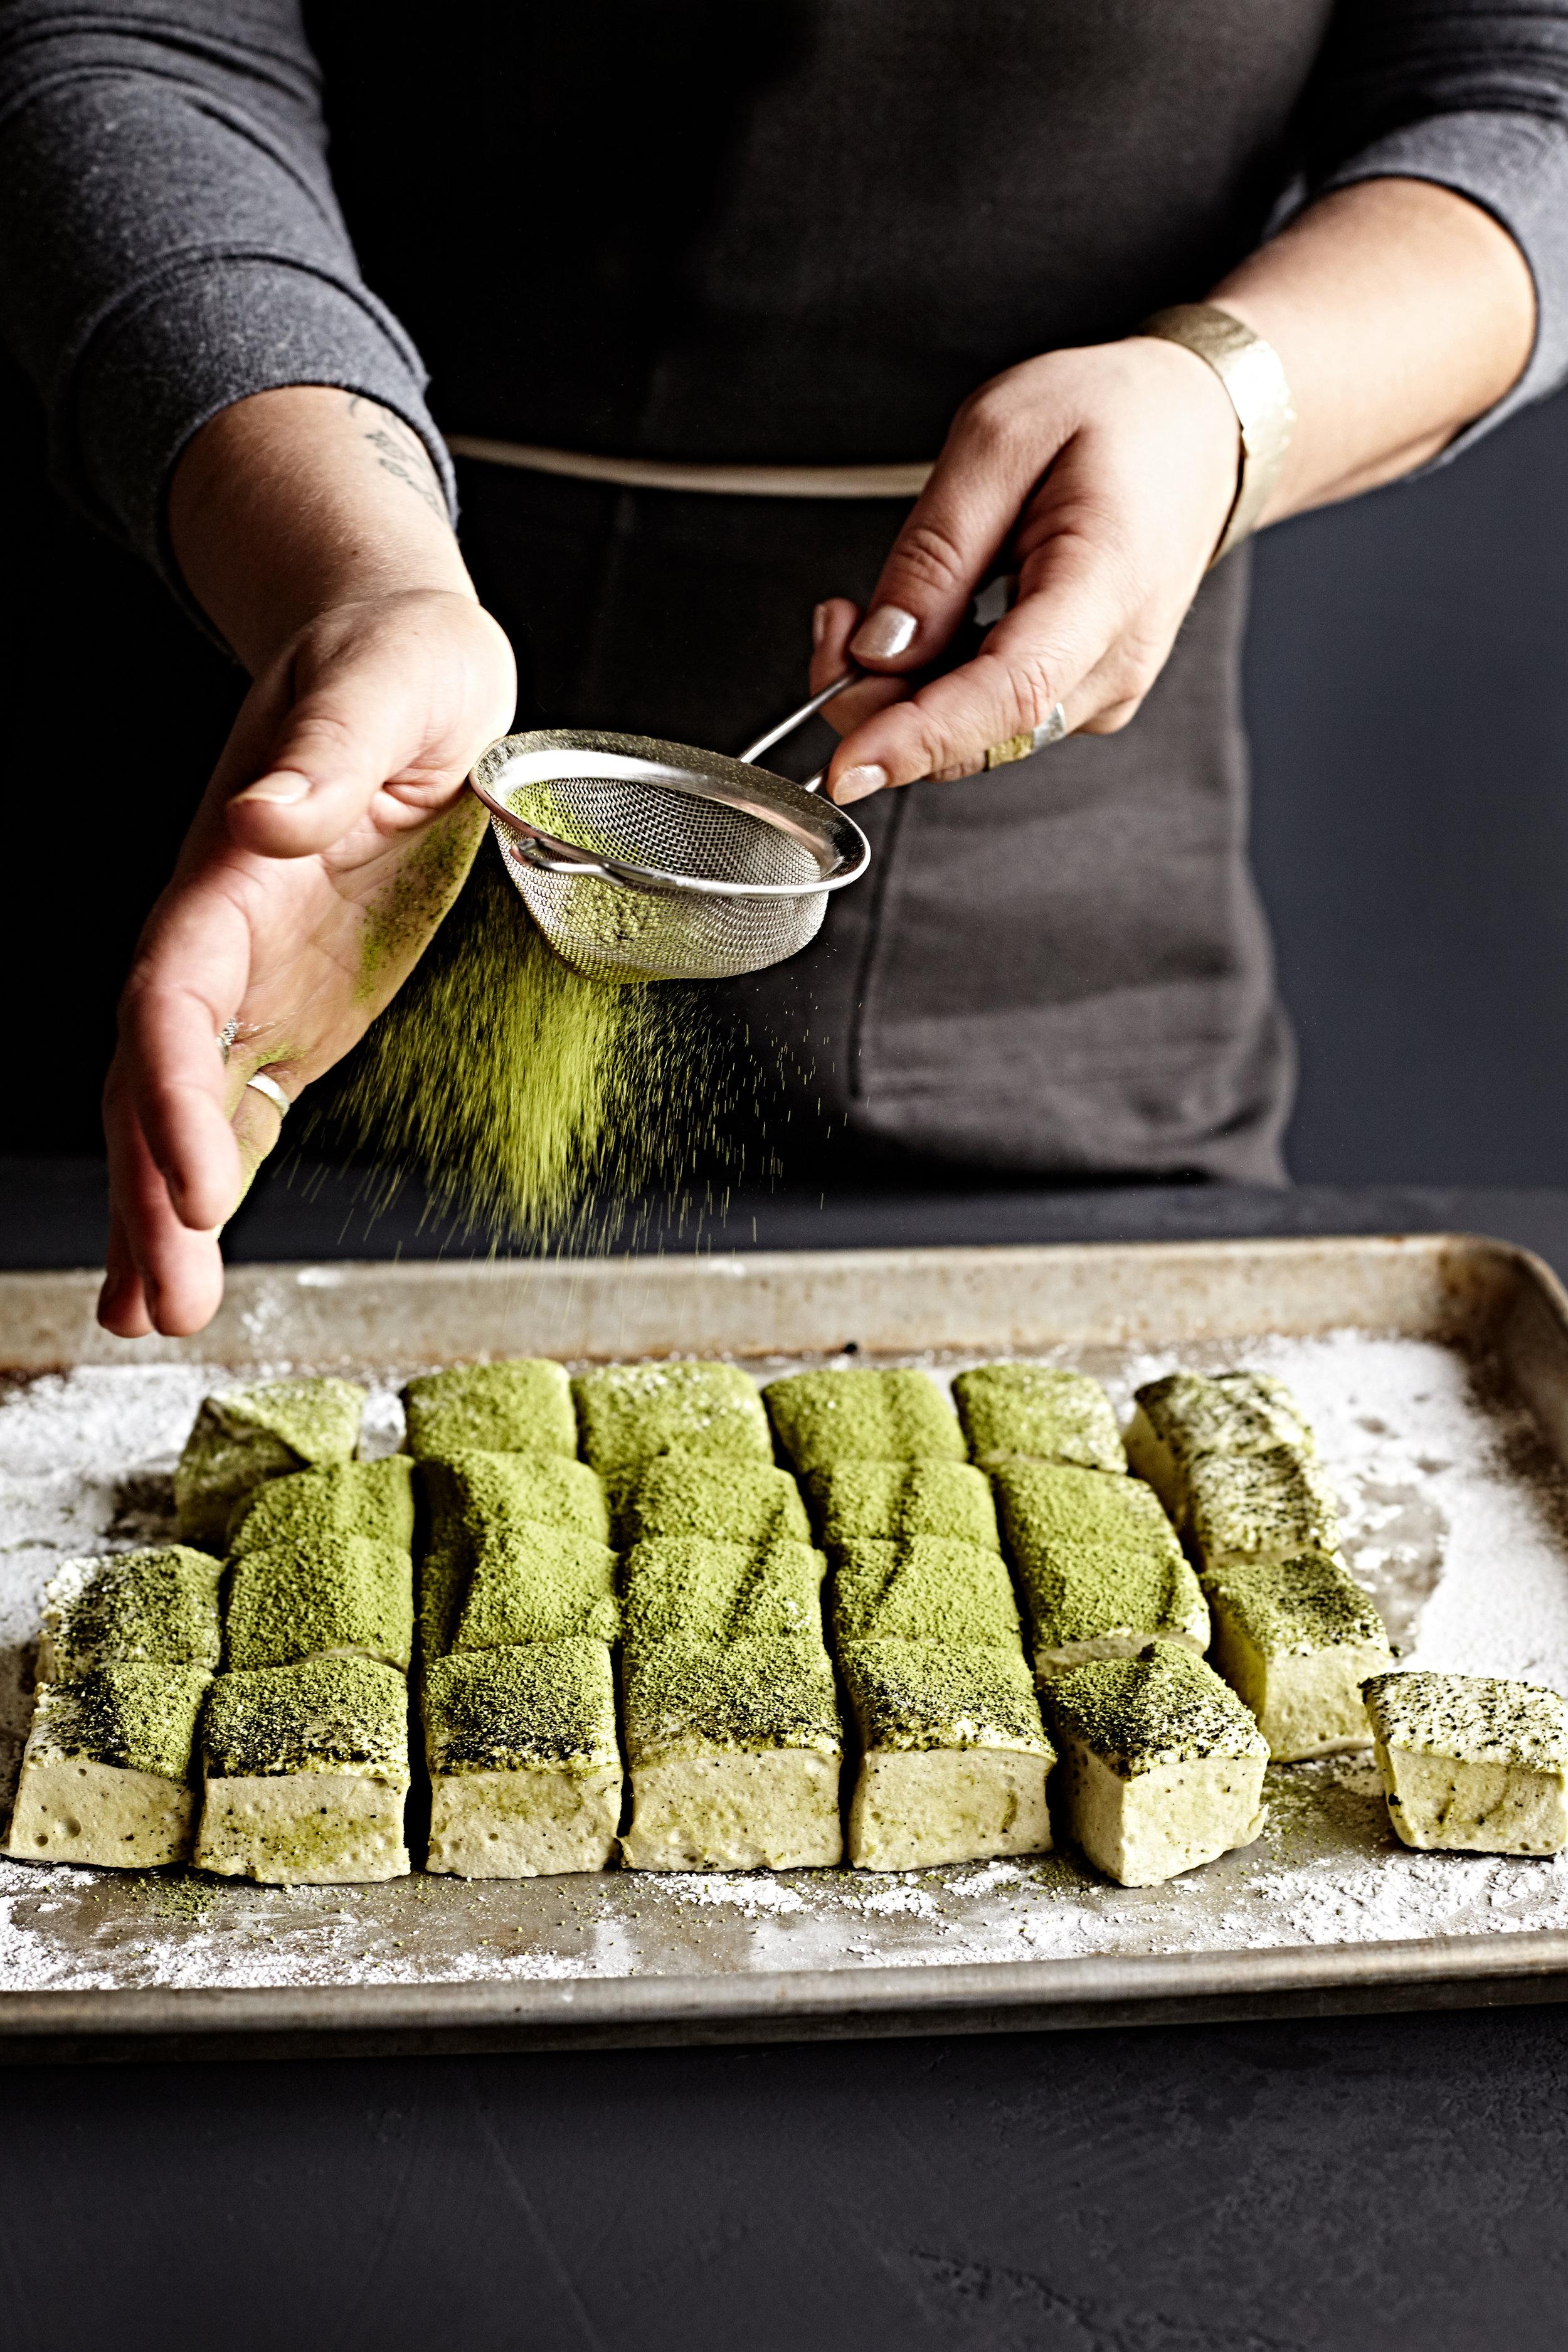 Woman's hand shaking matcha green tea onto homemade matcha marshmallows